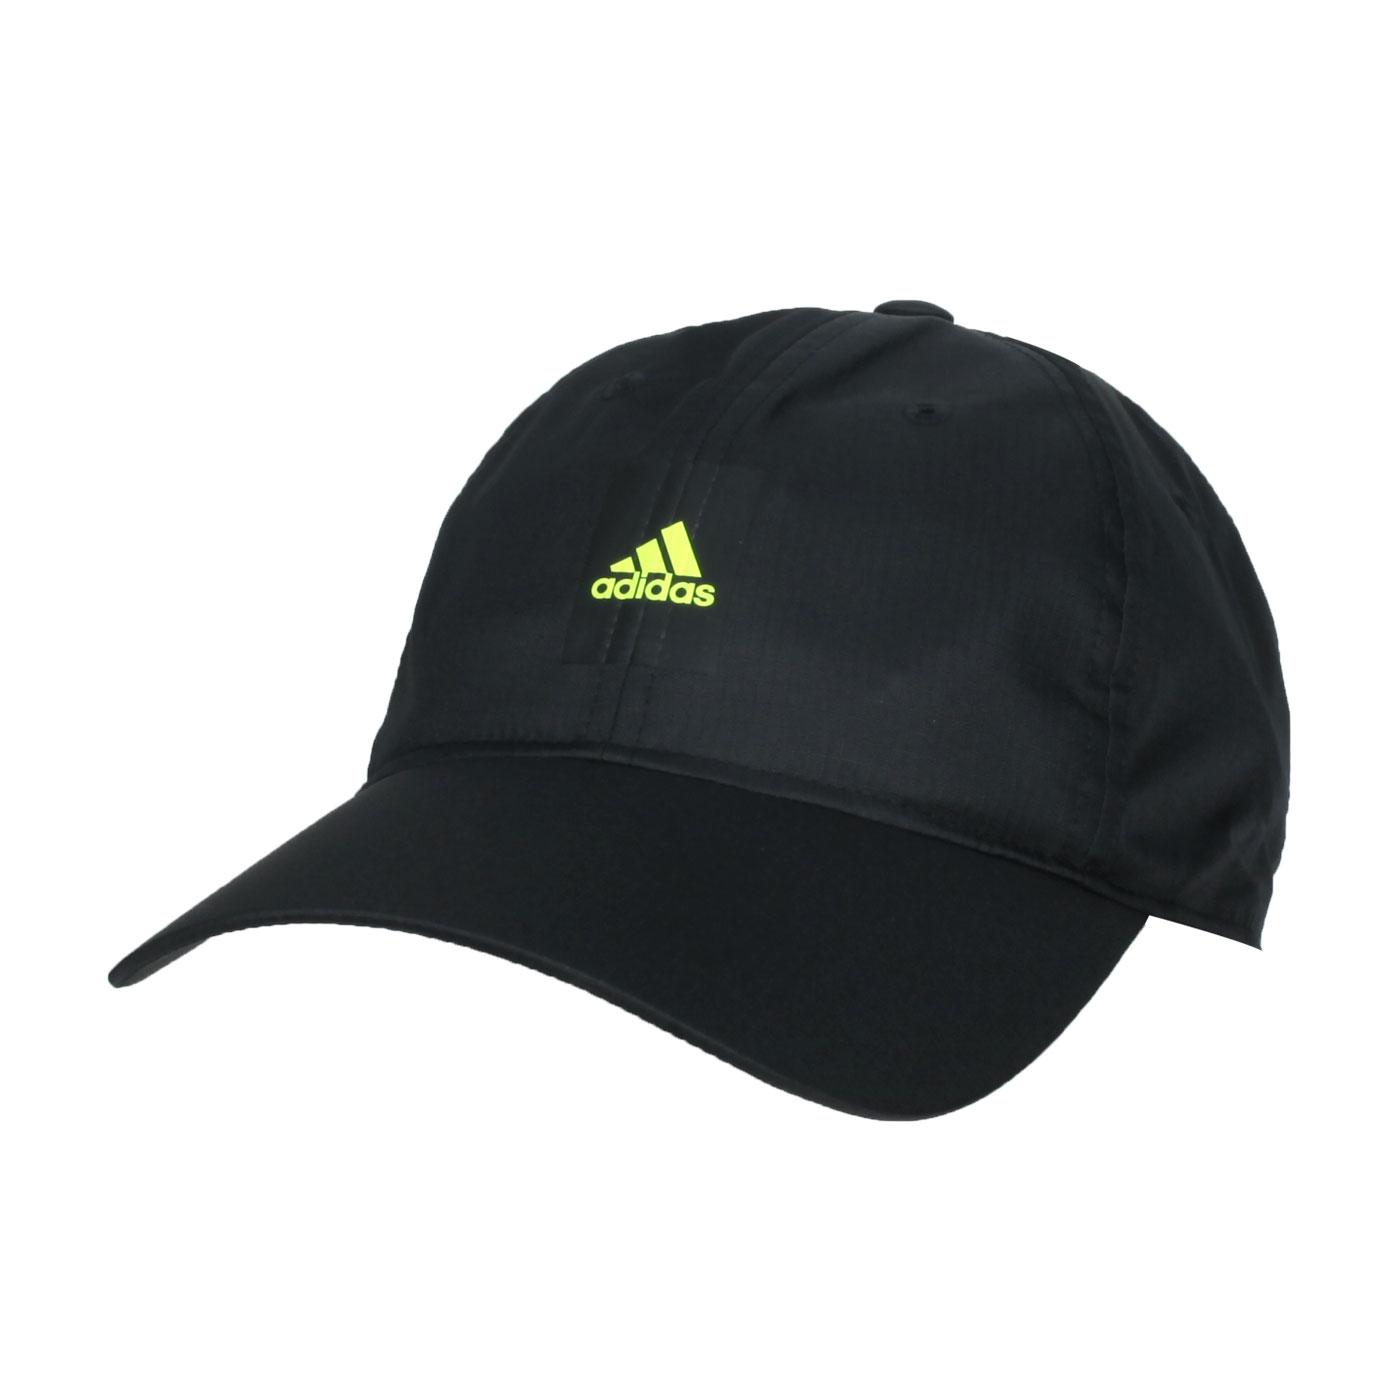 ADIDAS 帽子 GN2002 - 黑綠